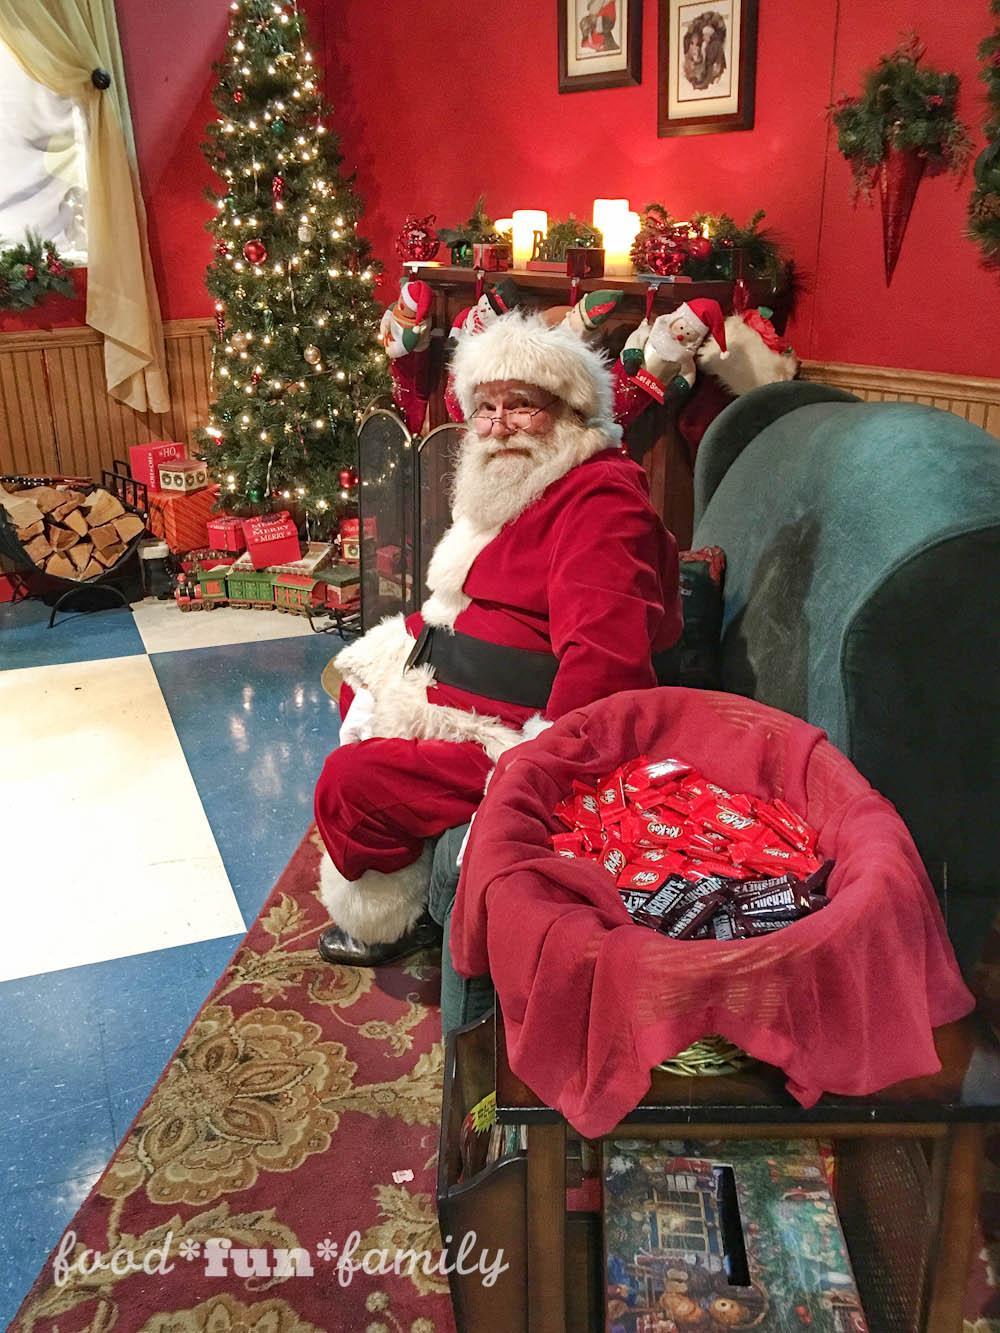 Hersheypark Christmas Candylane at Food Fun Family